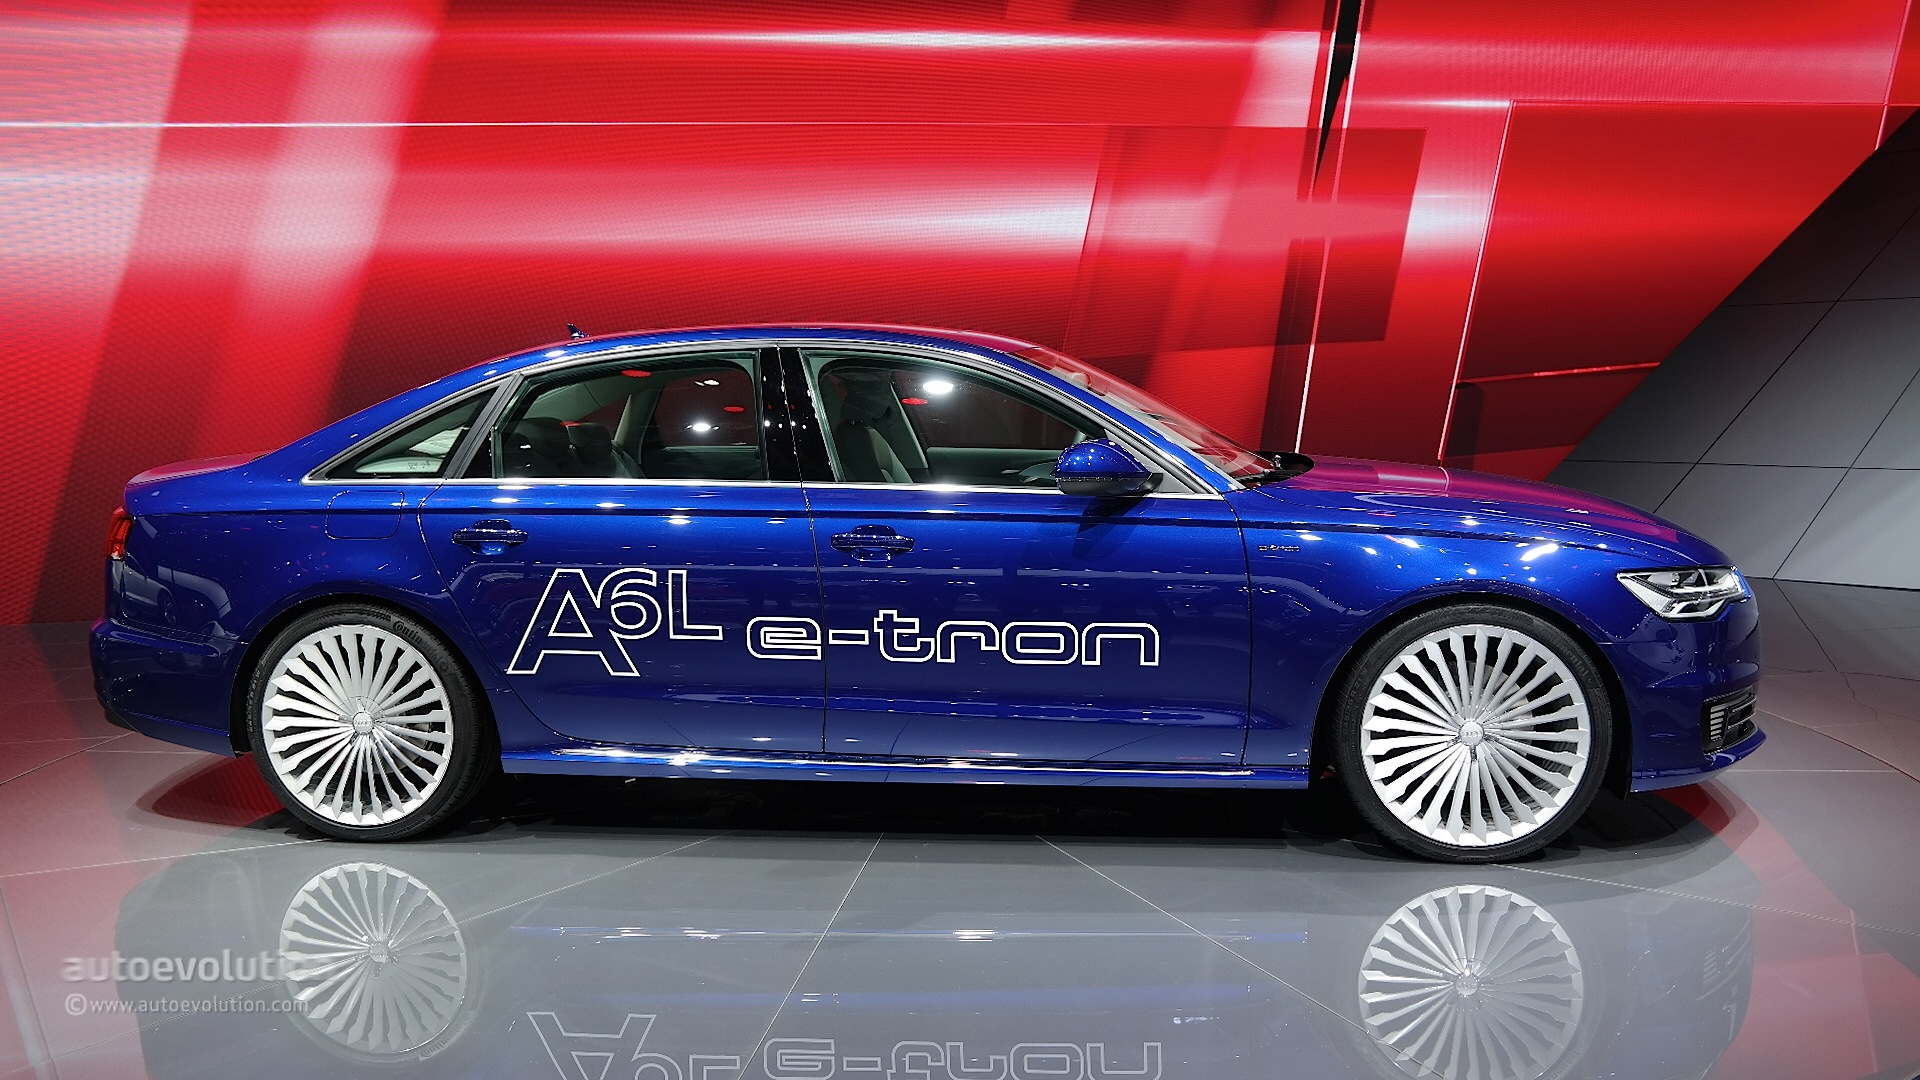 Audi A6 L E Tron Plug In Hybrid Debuts At Auto Shanghai